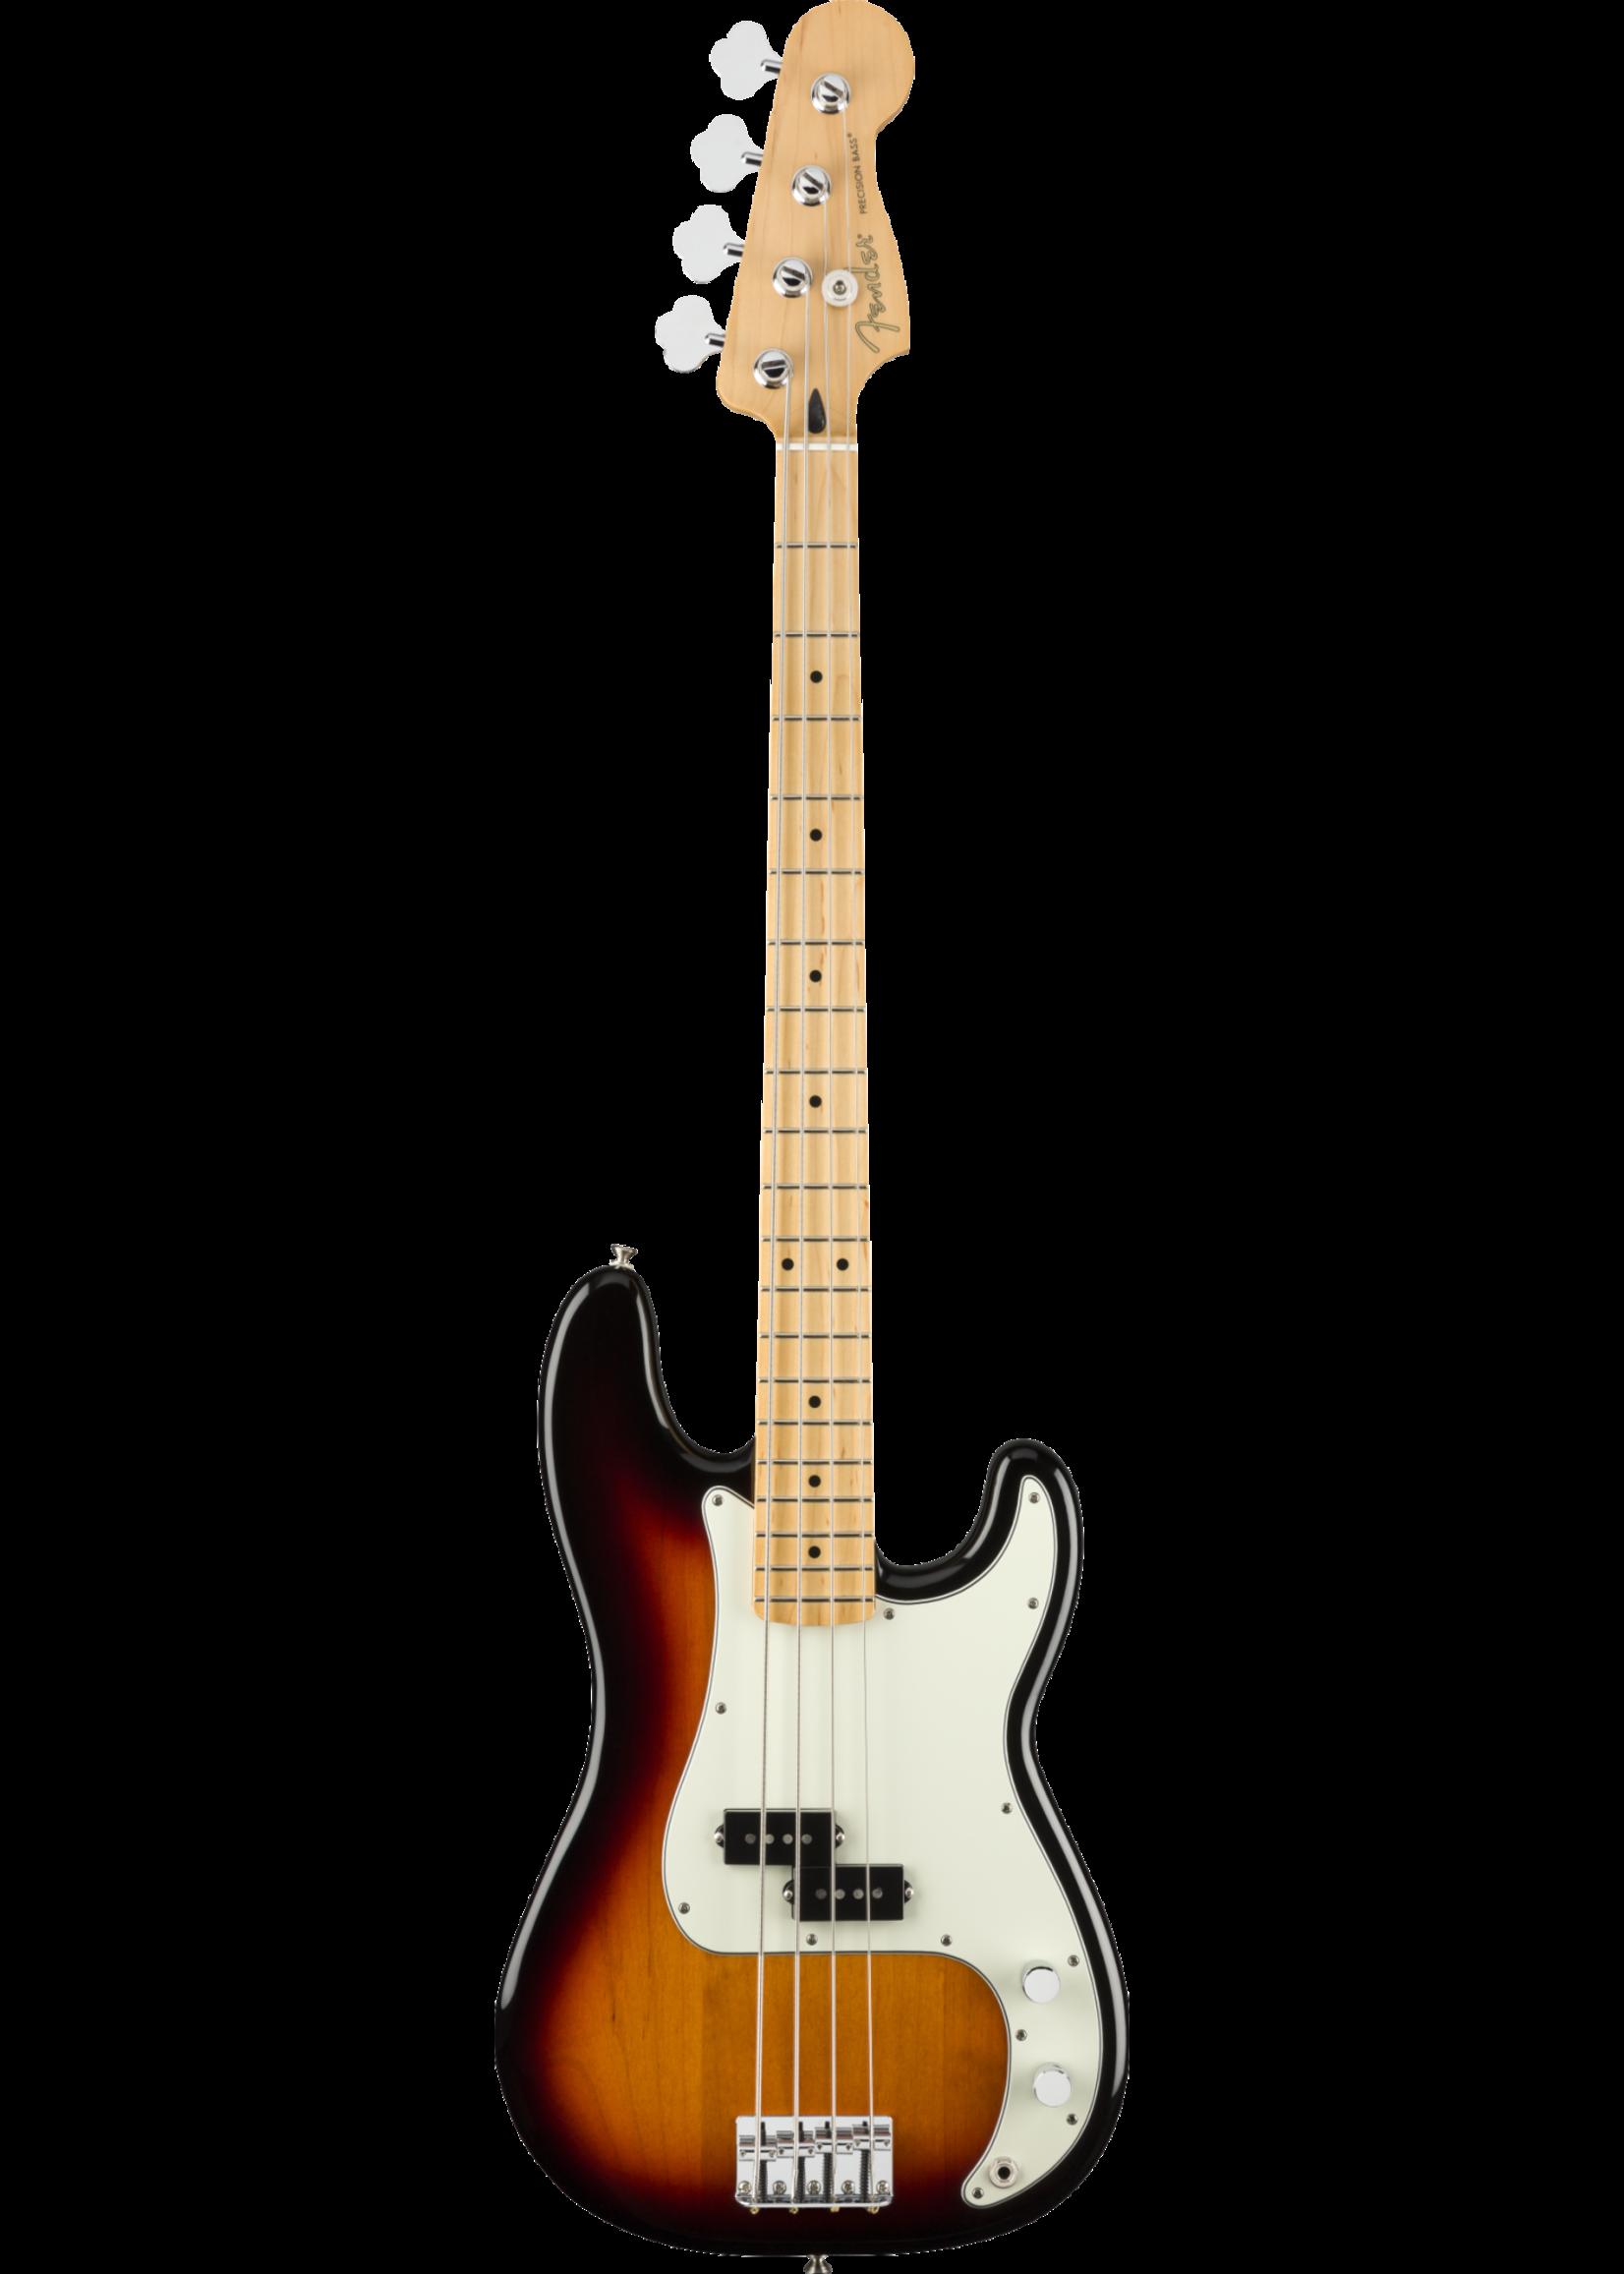 Fender Fender Player Precision Bass 3-Color Sunburst Maple Fingerboard